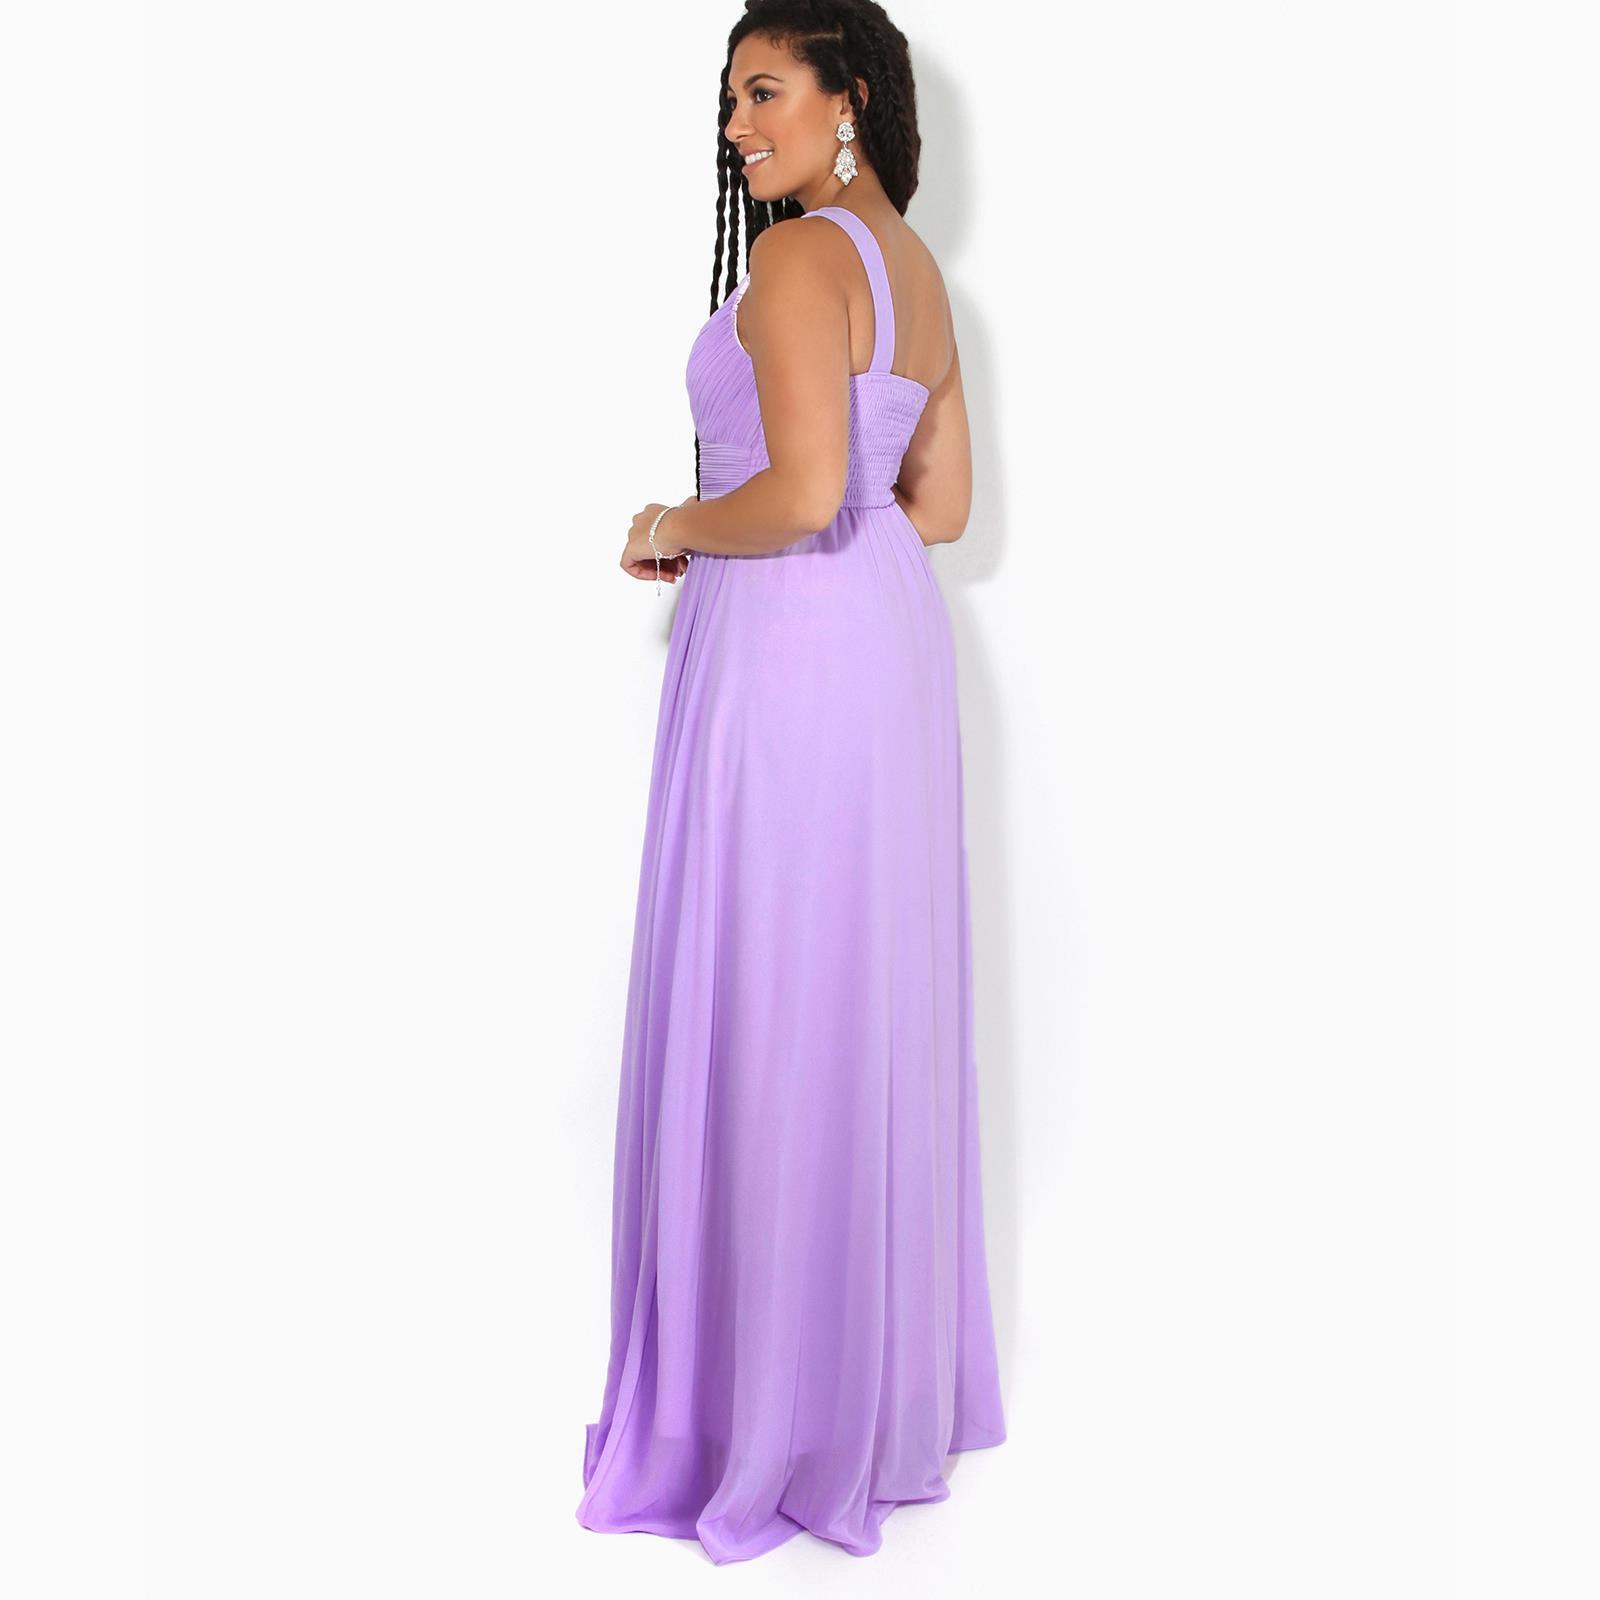 Womens-Wedding-Bridesmaid-Prom-Dress-Formal-One-Off-Shoulder-Long-Evening-8-18 thumbnail 31